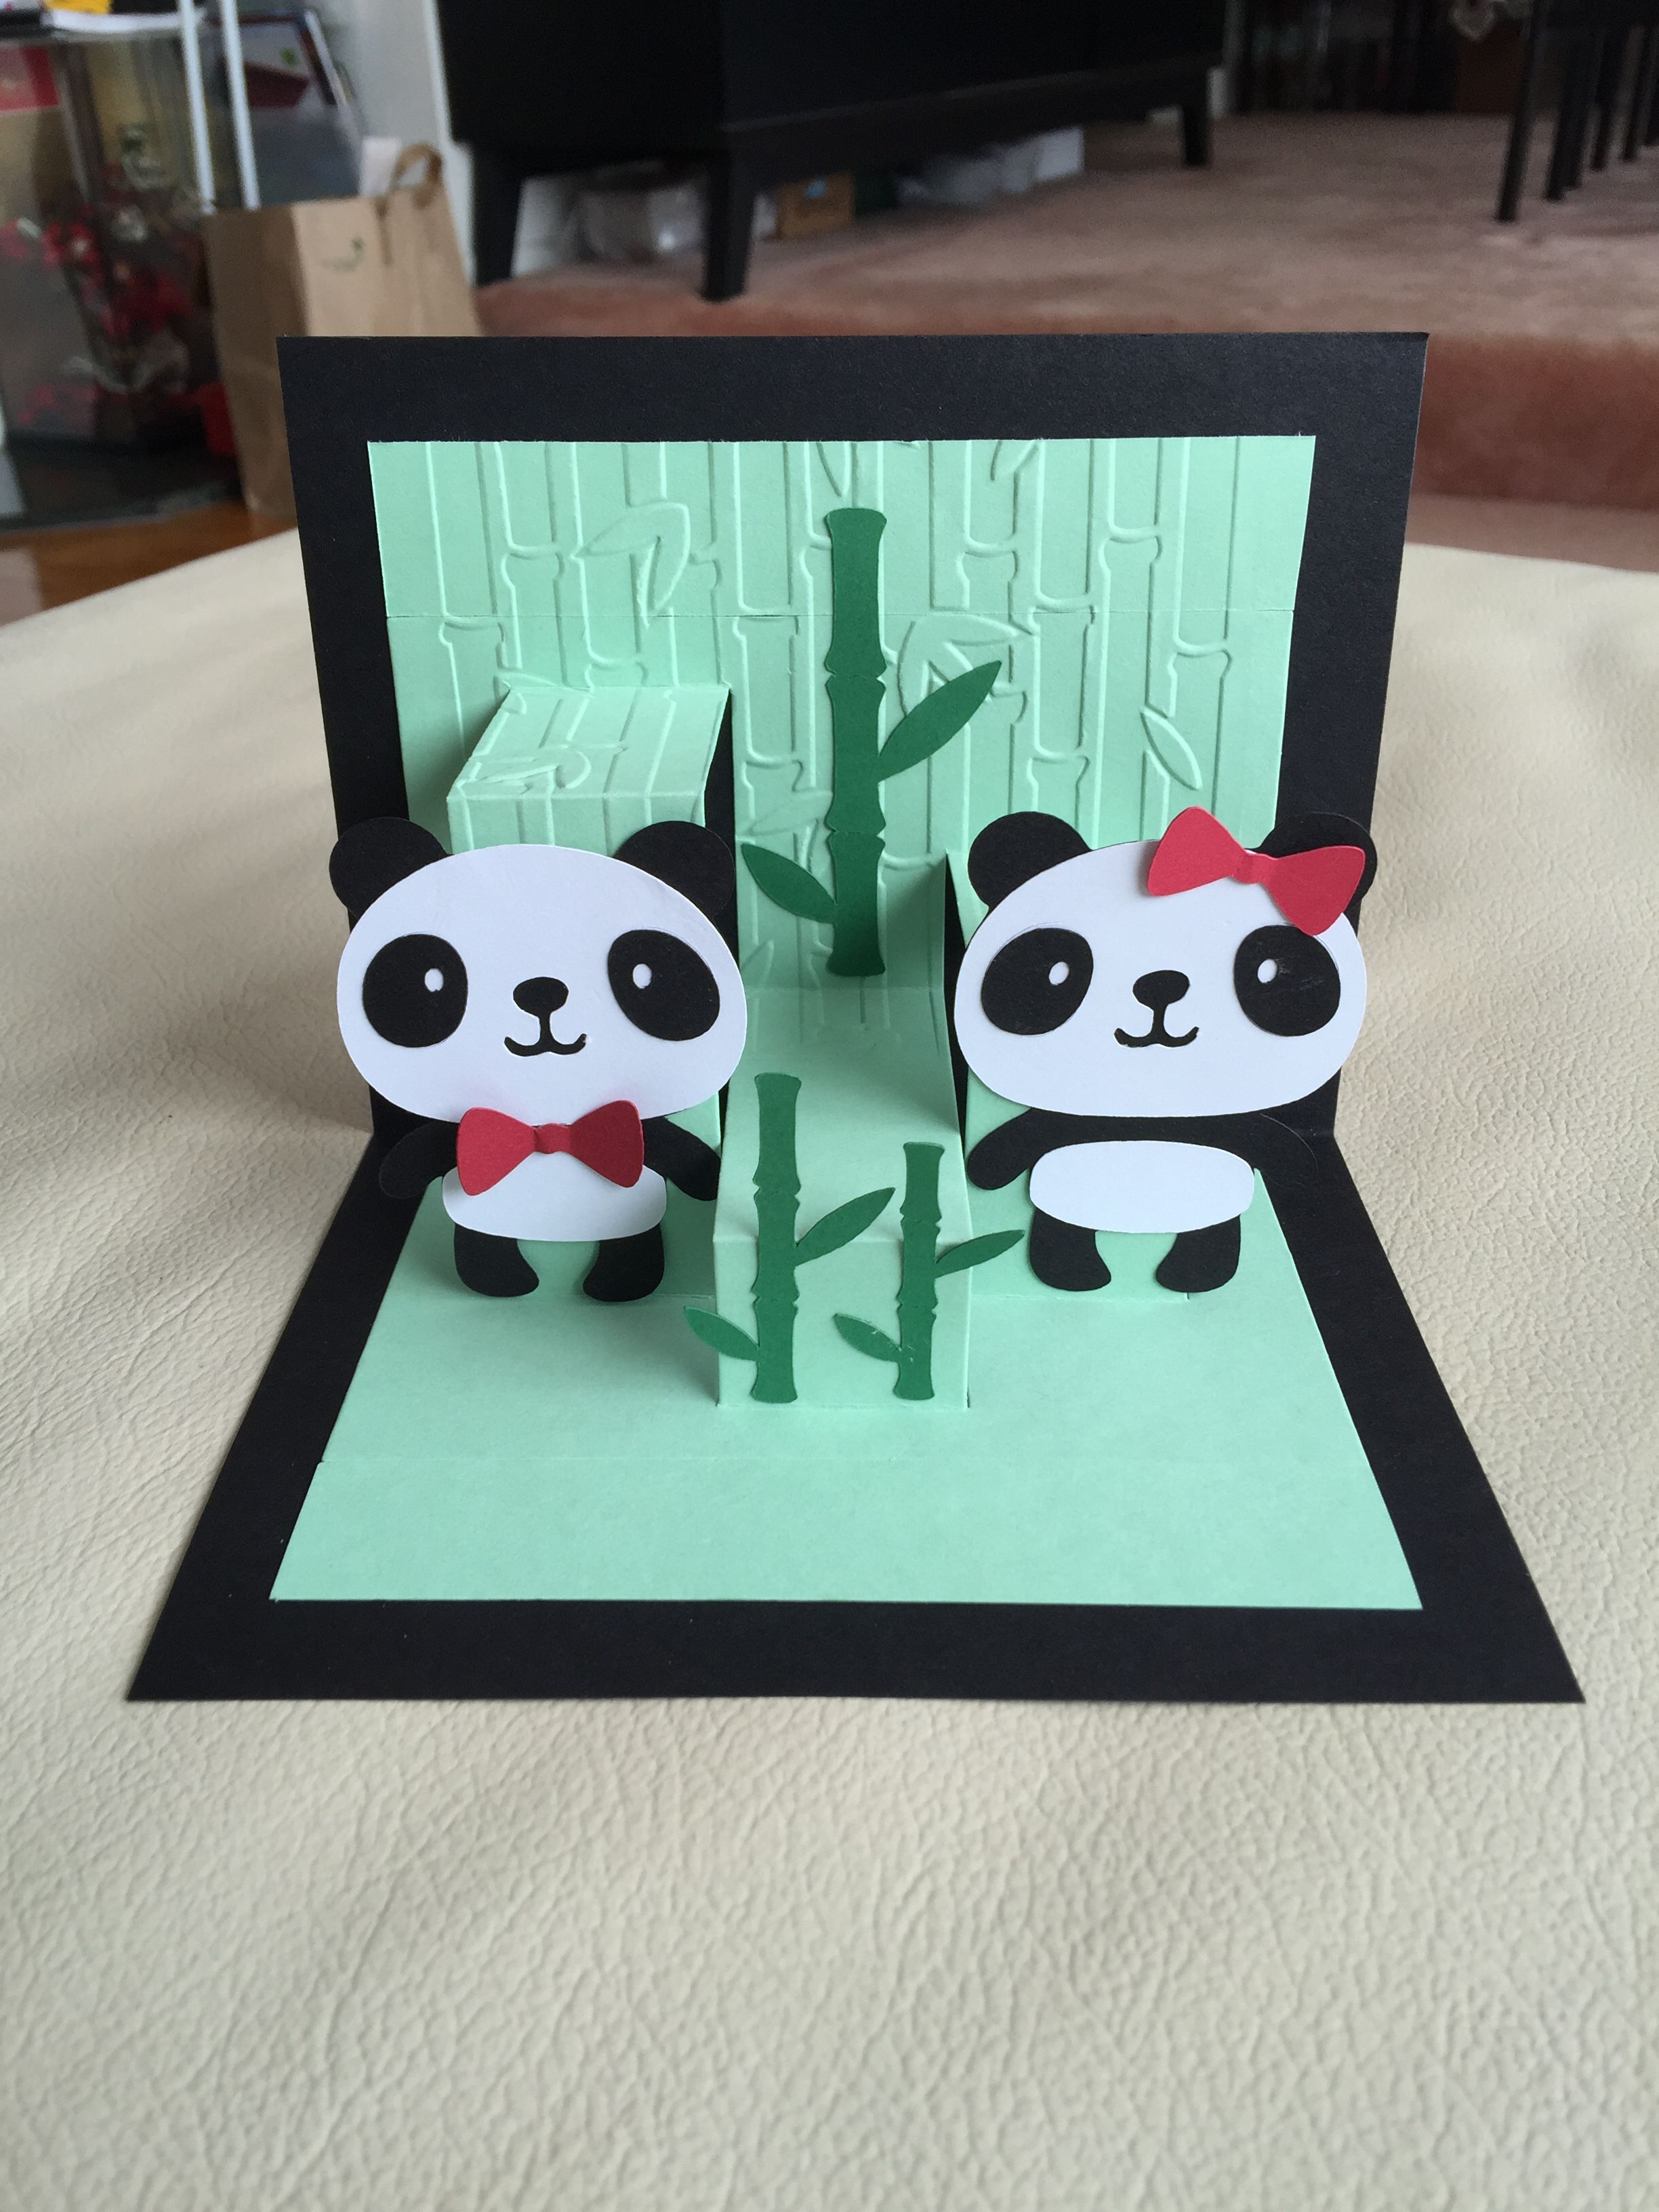 Panda Pop Up Card Panda Card Panda Birthday Cards Birthday Cards Diy